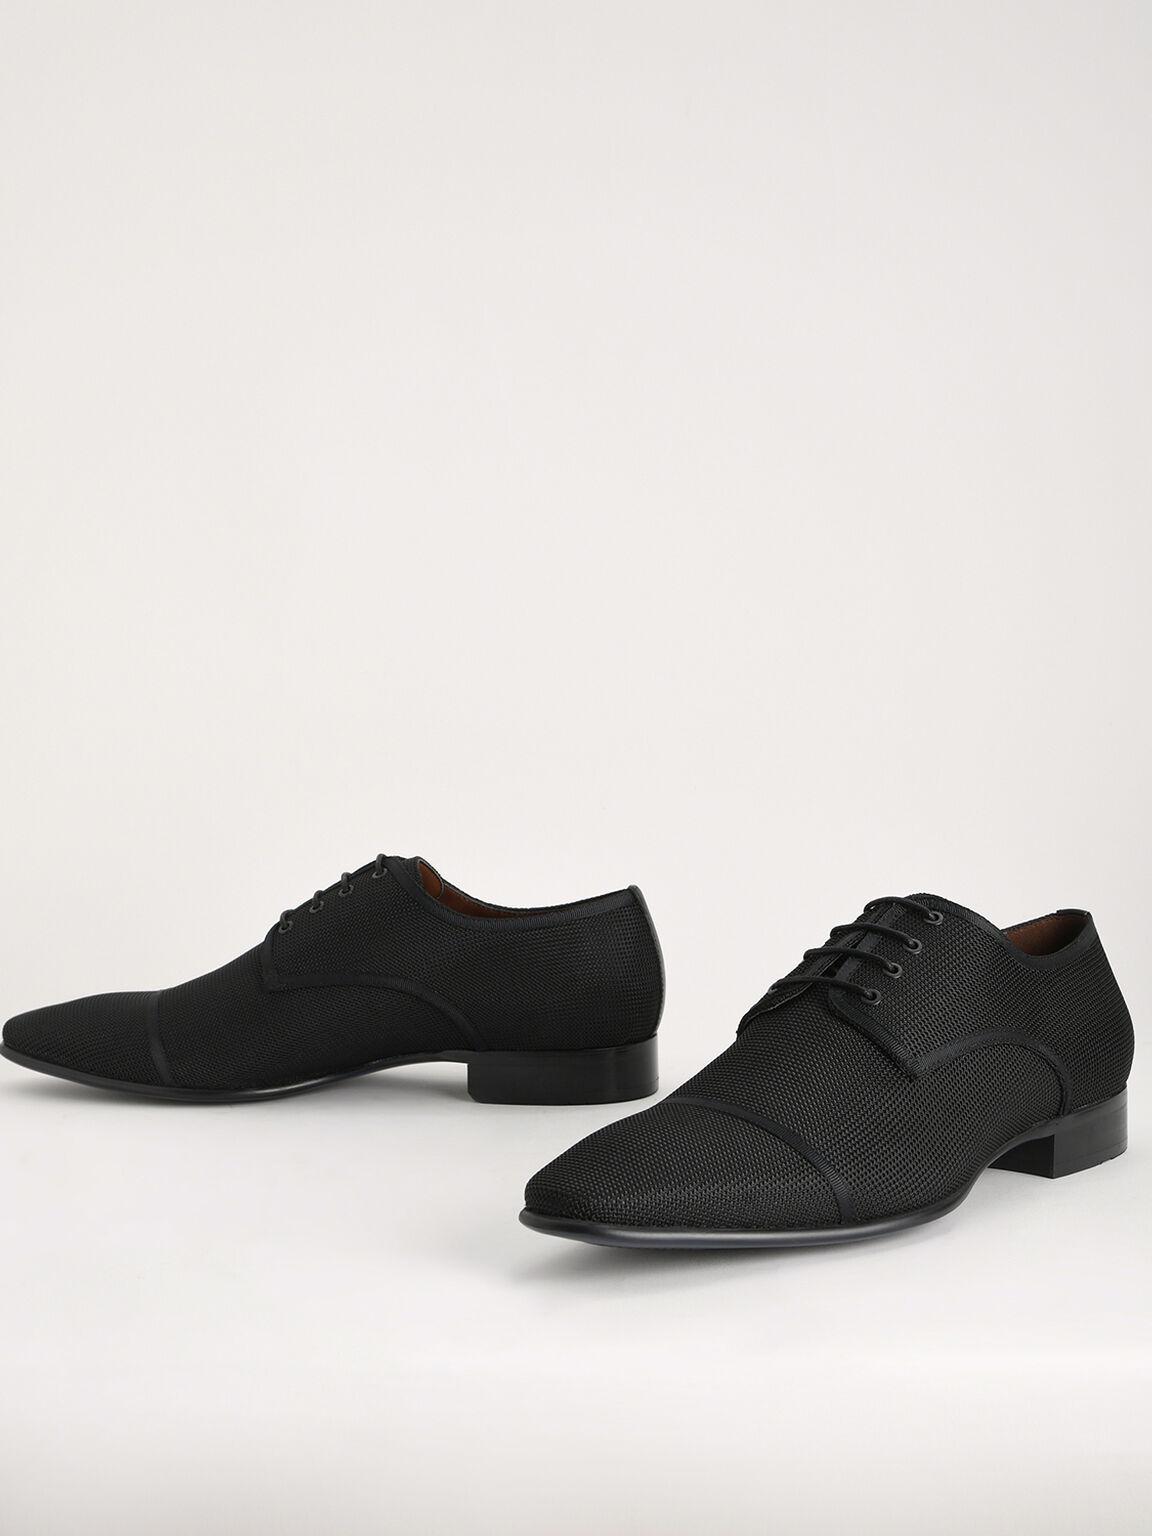 Mesh Derby Shoes, Black, hi-res